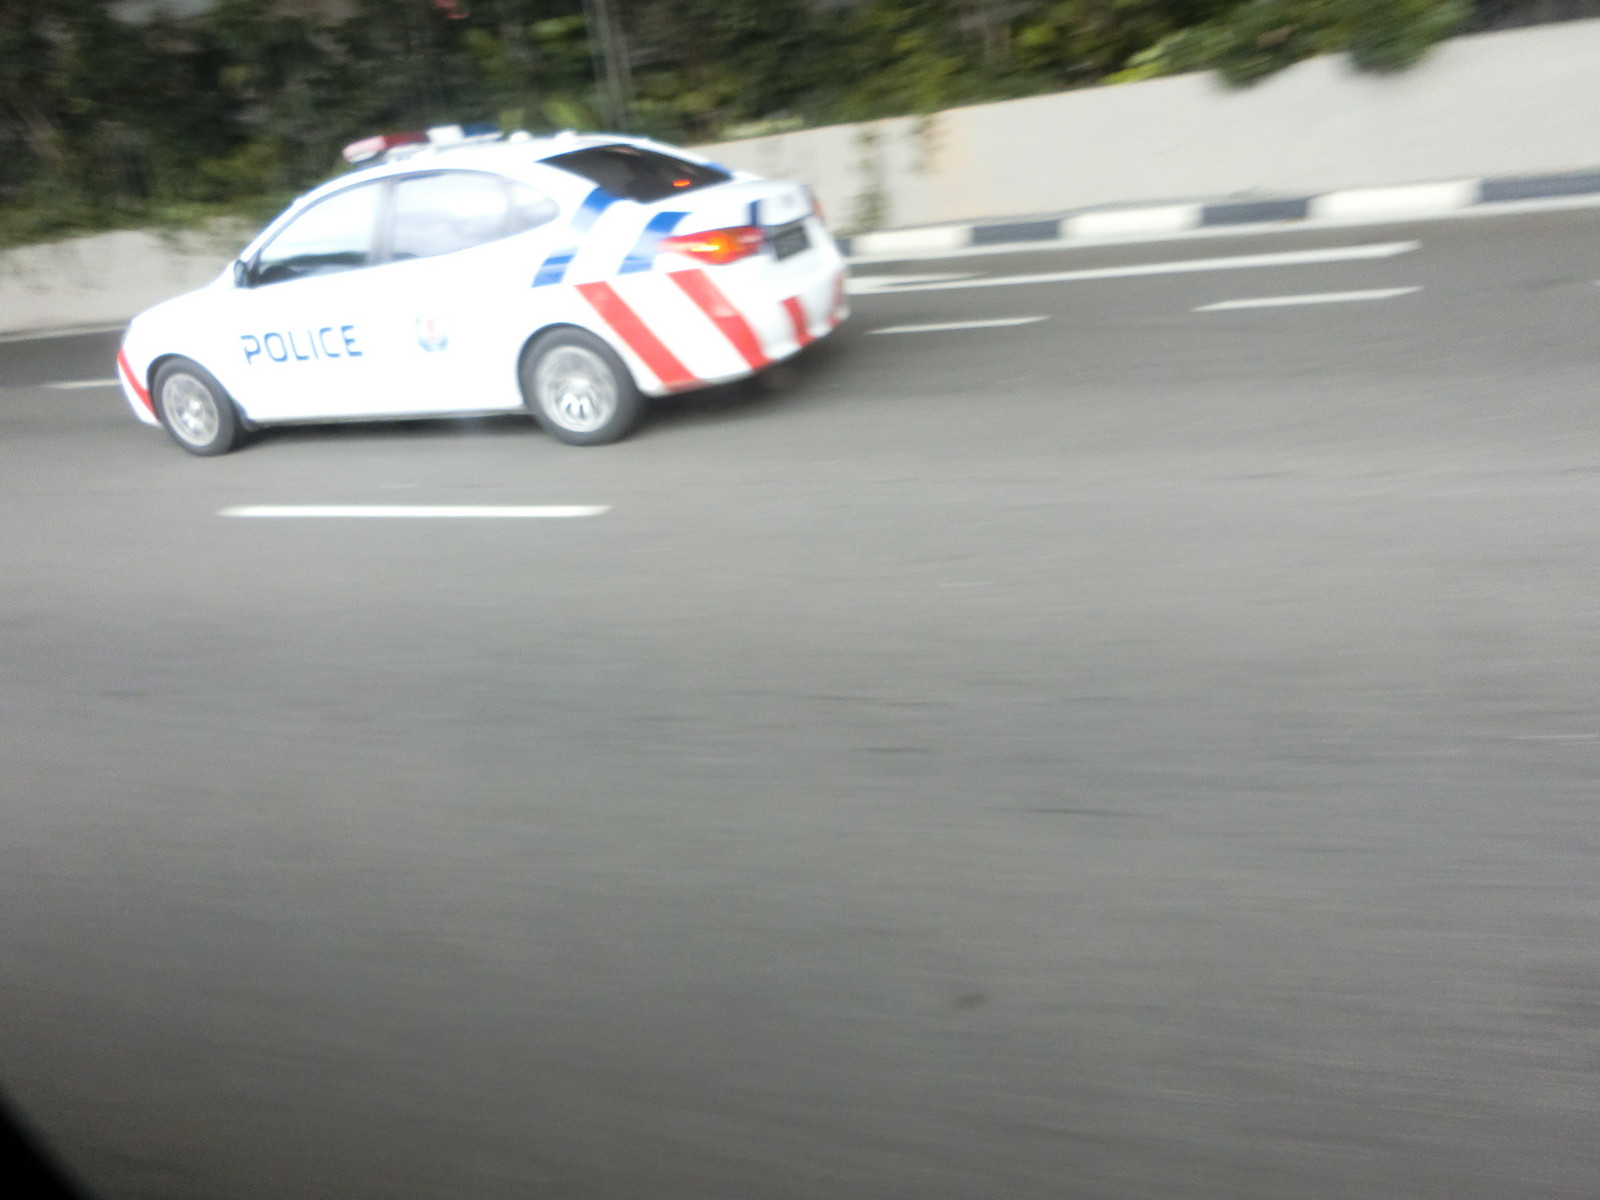 Singapore_fast_response_car